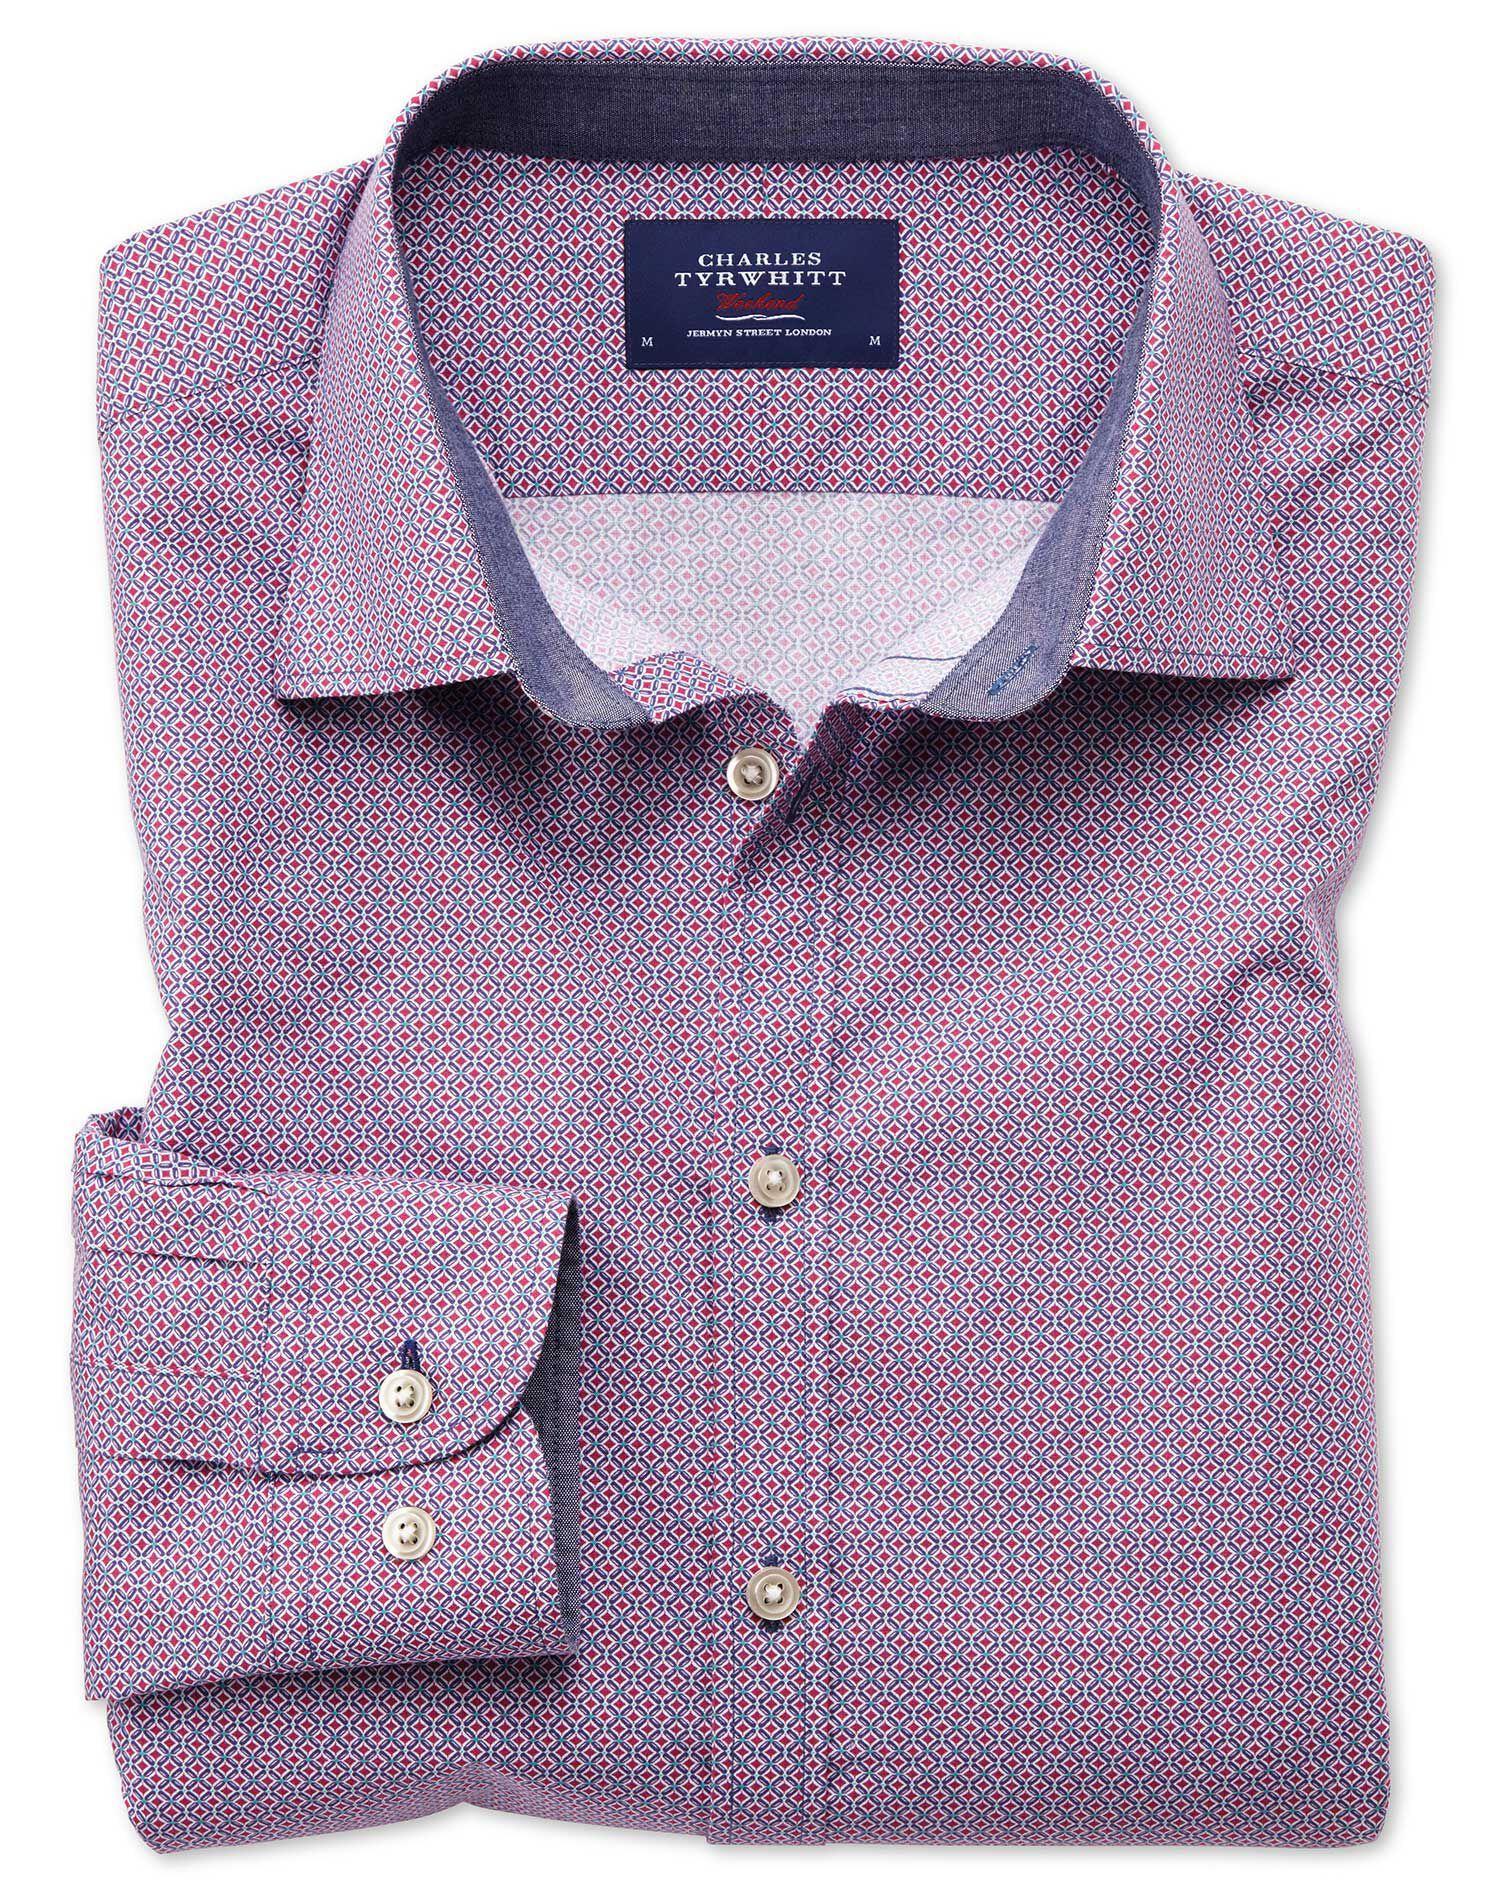 Extra Slim Fit Magenta and Blue Print Cotton Shirt Single Cuff Size Medium by Charles Tyrwhitt